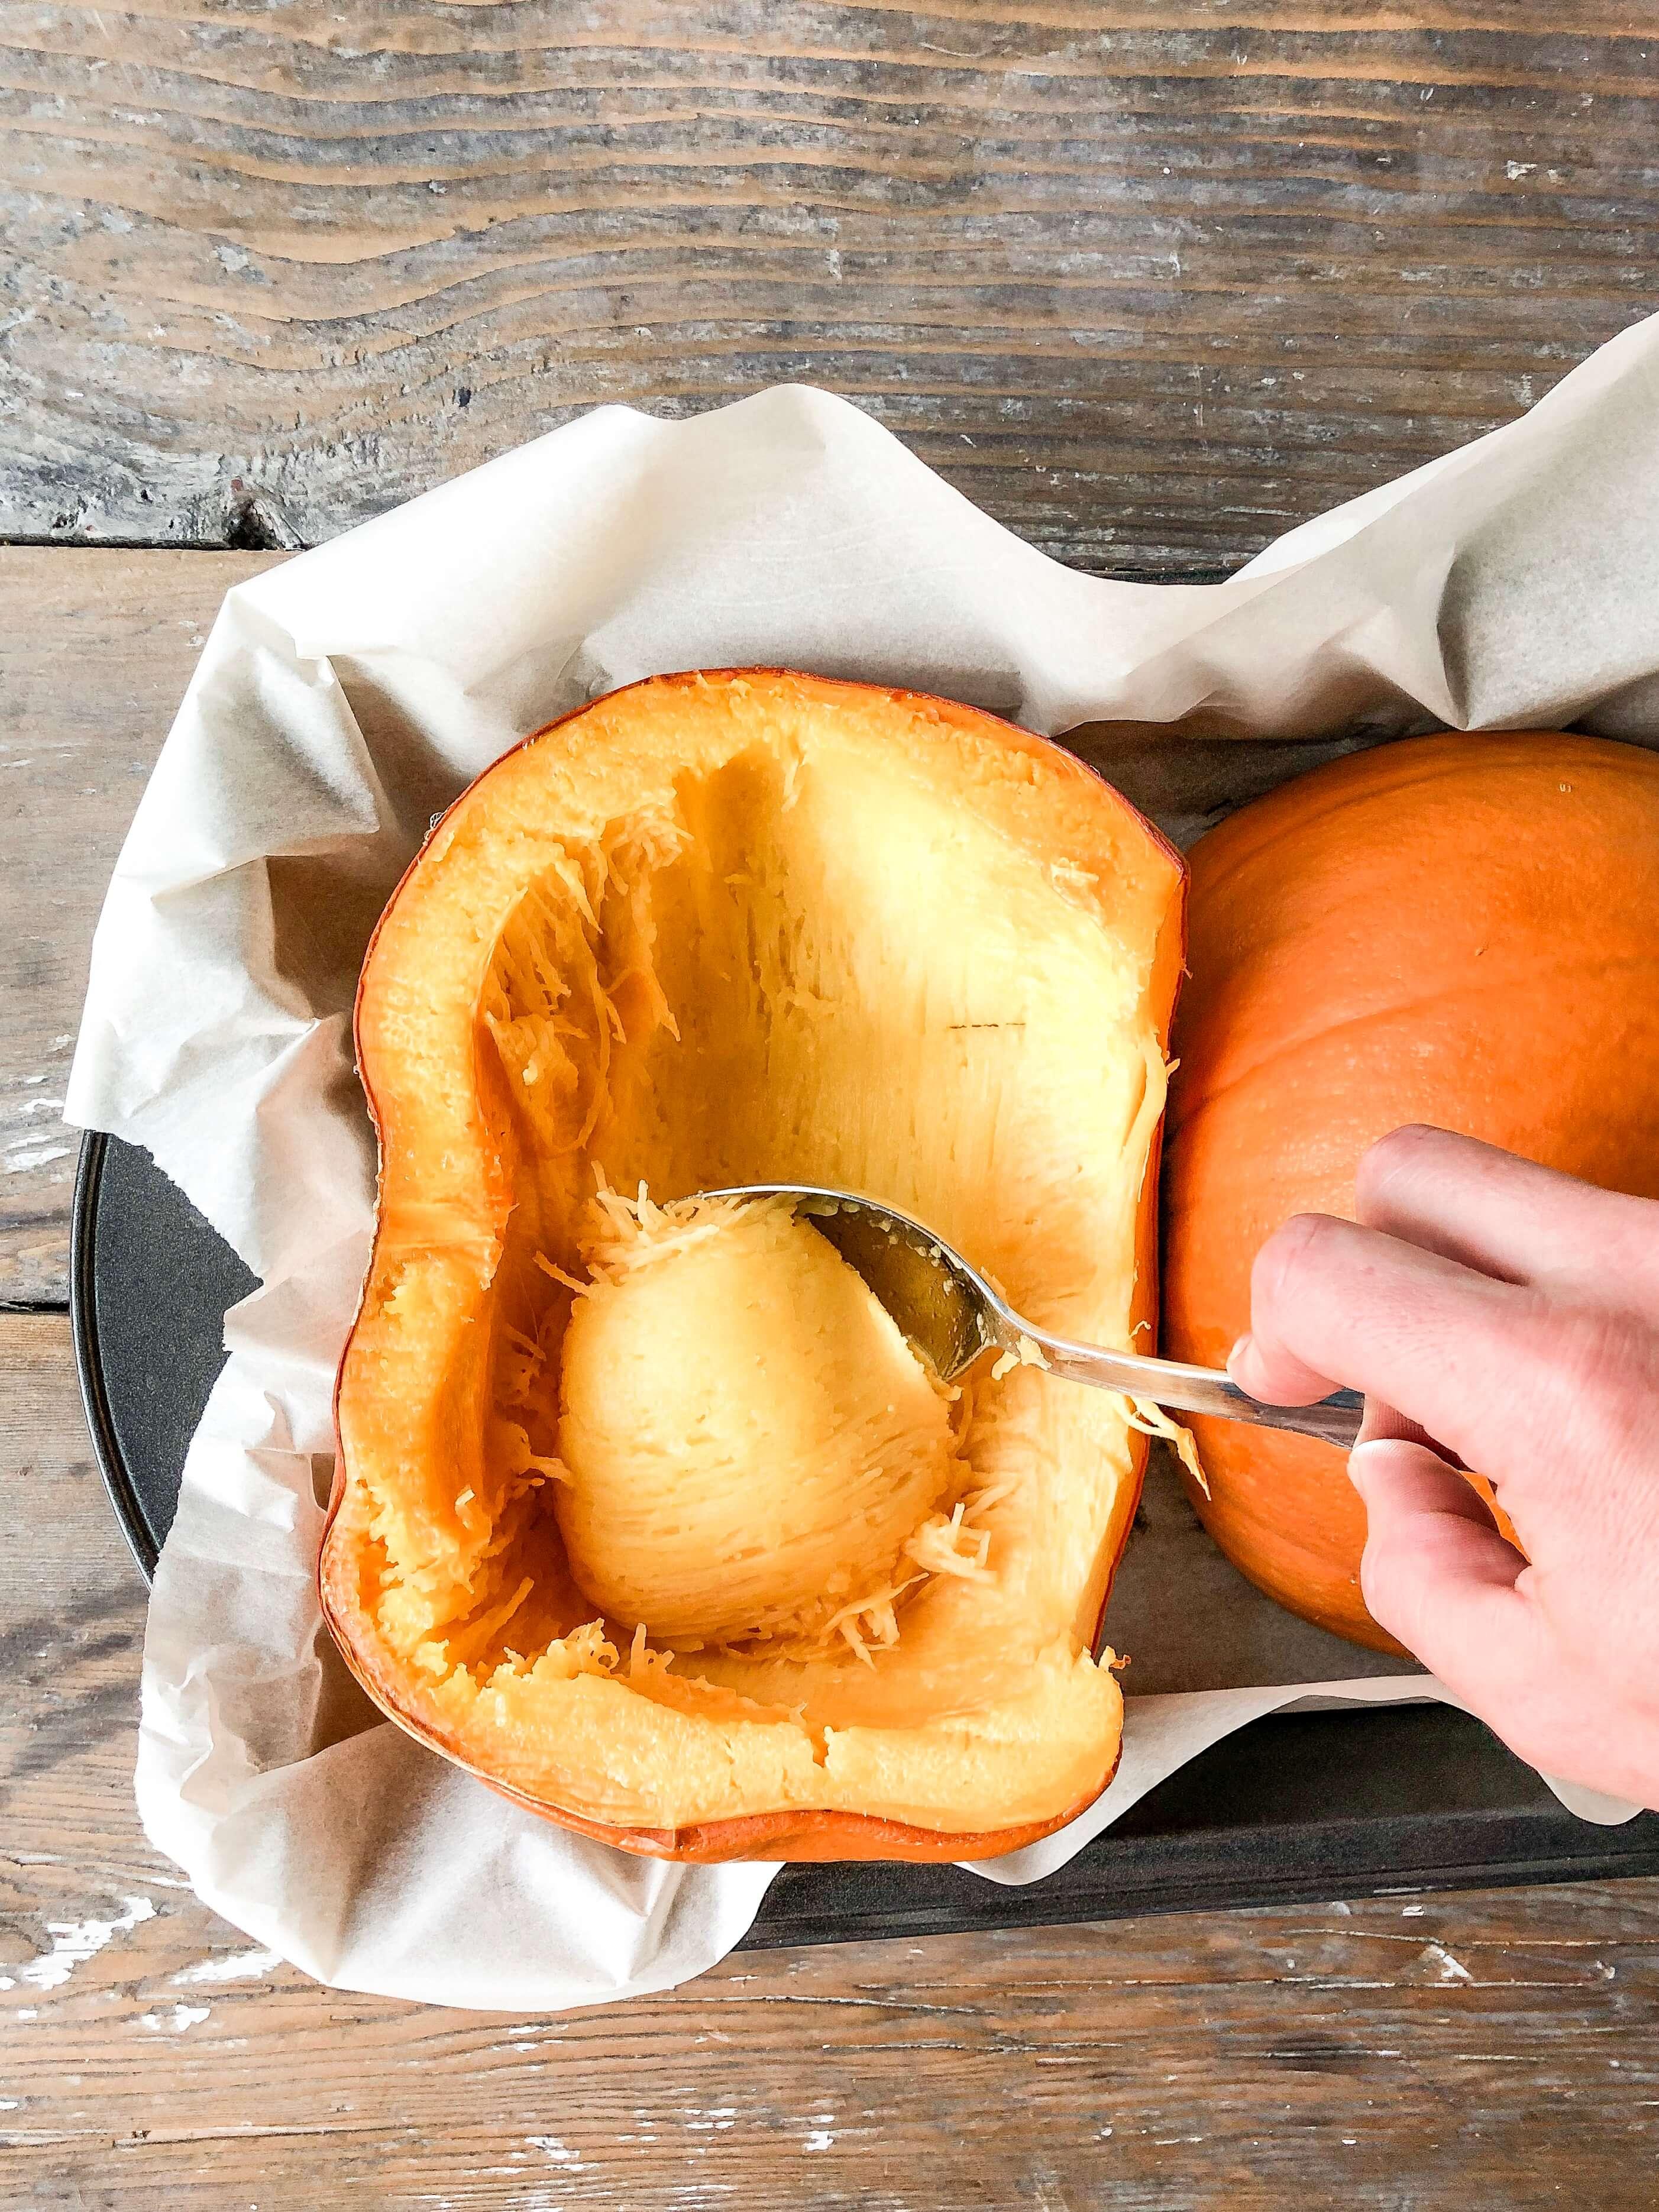 Puree from a pumpkin